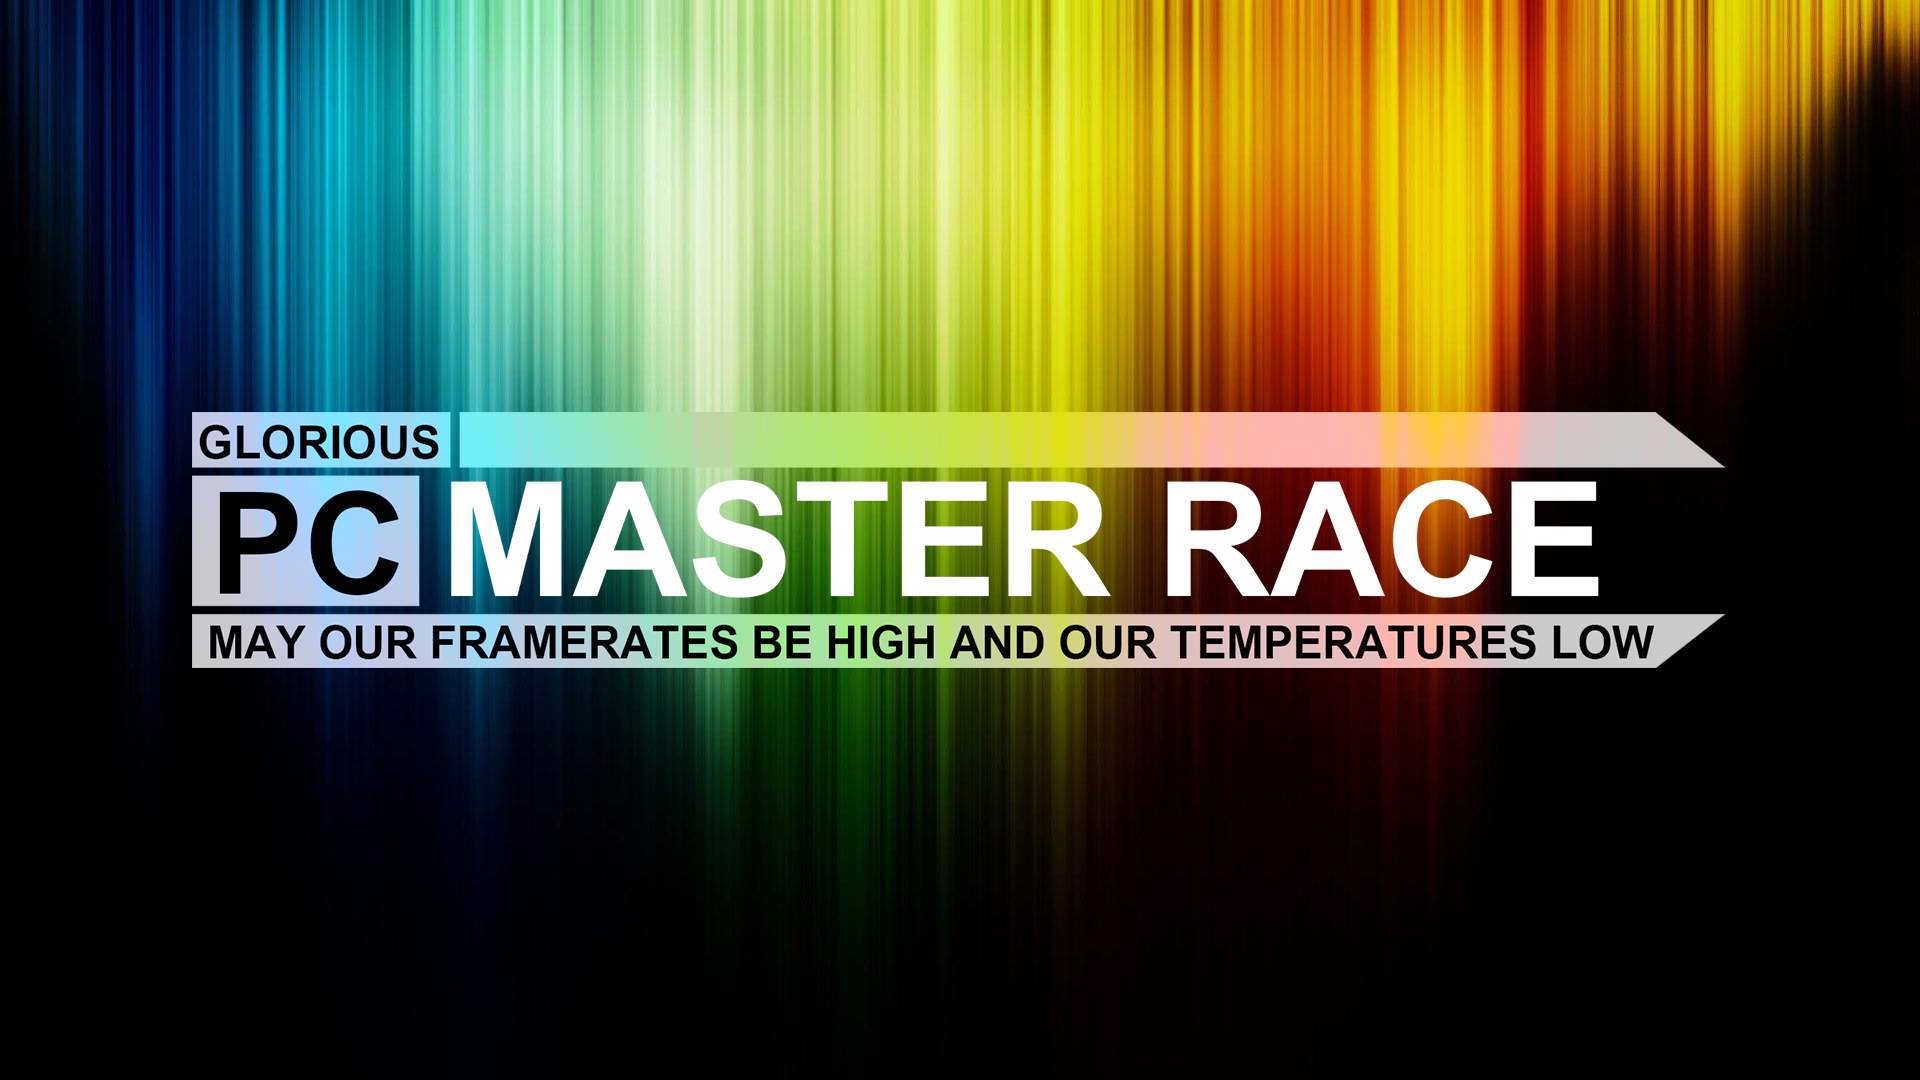 Glorious Pc Master Race Wallpaper